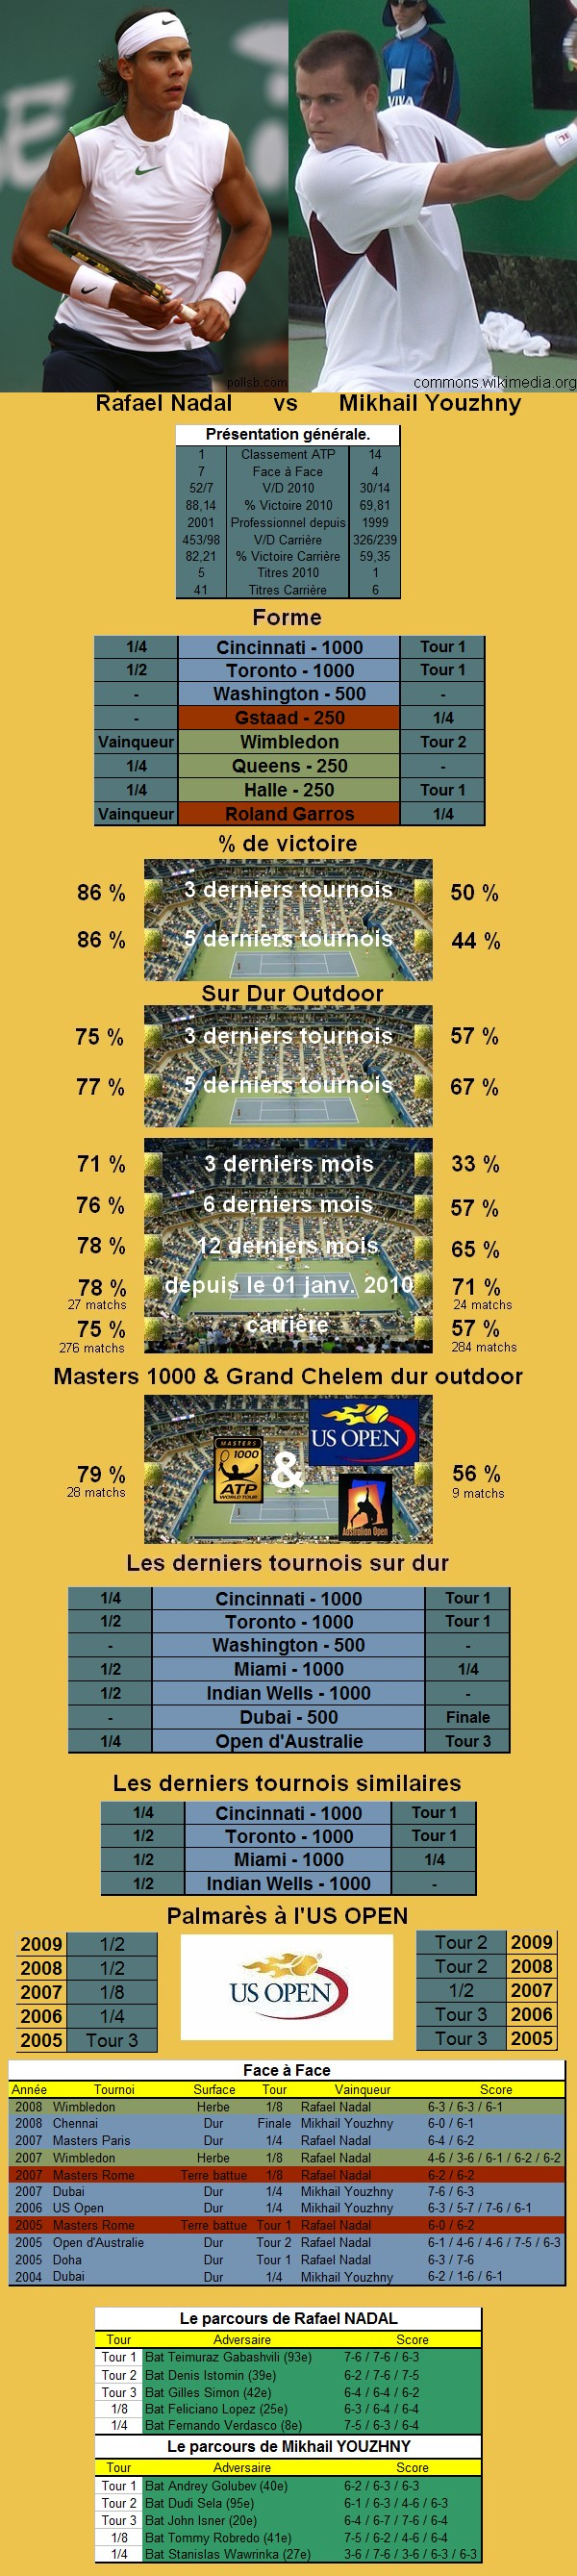 Statistiques tennis de Nadal contre Youzhny à l'US OPEN